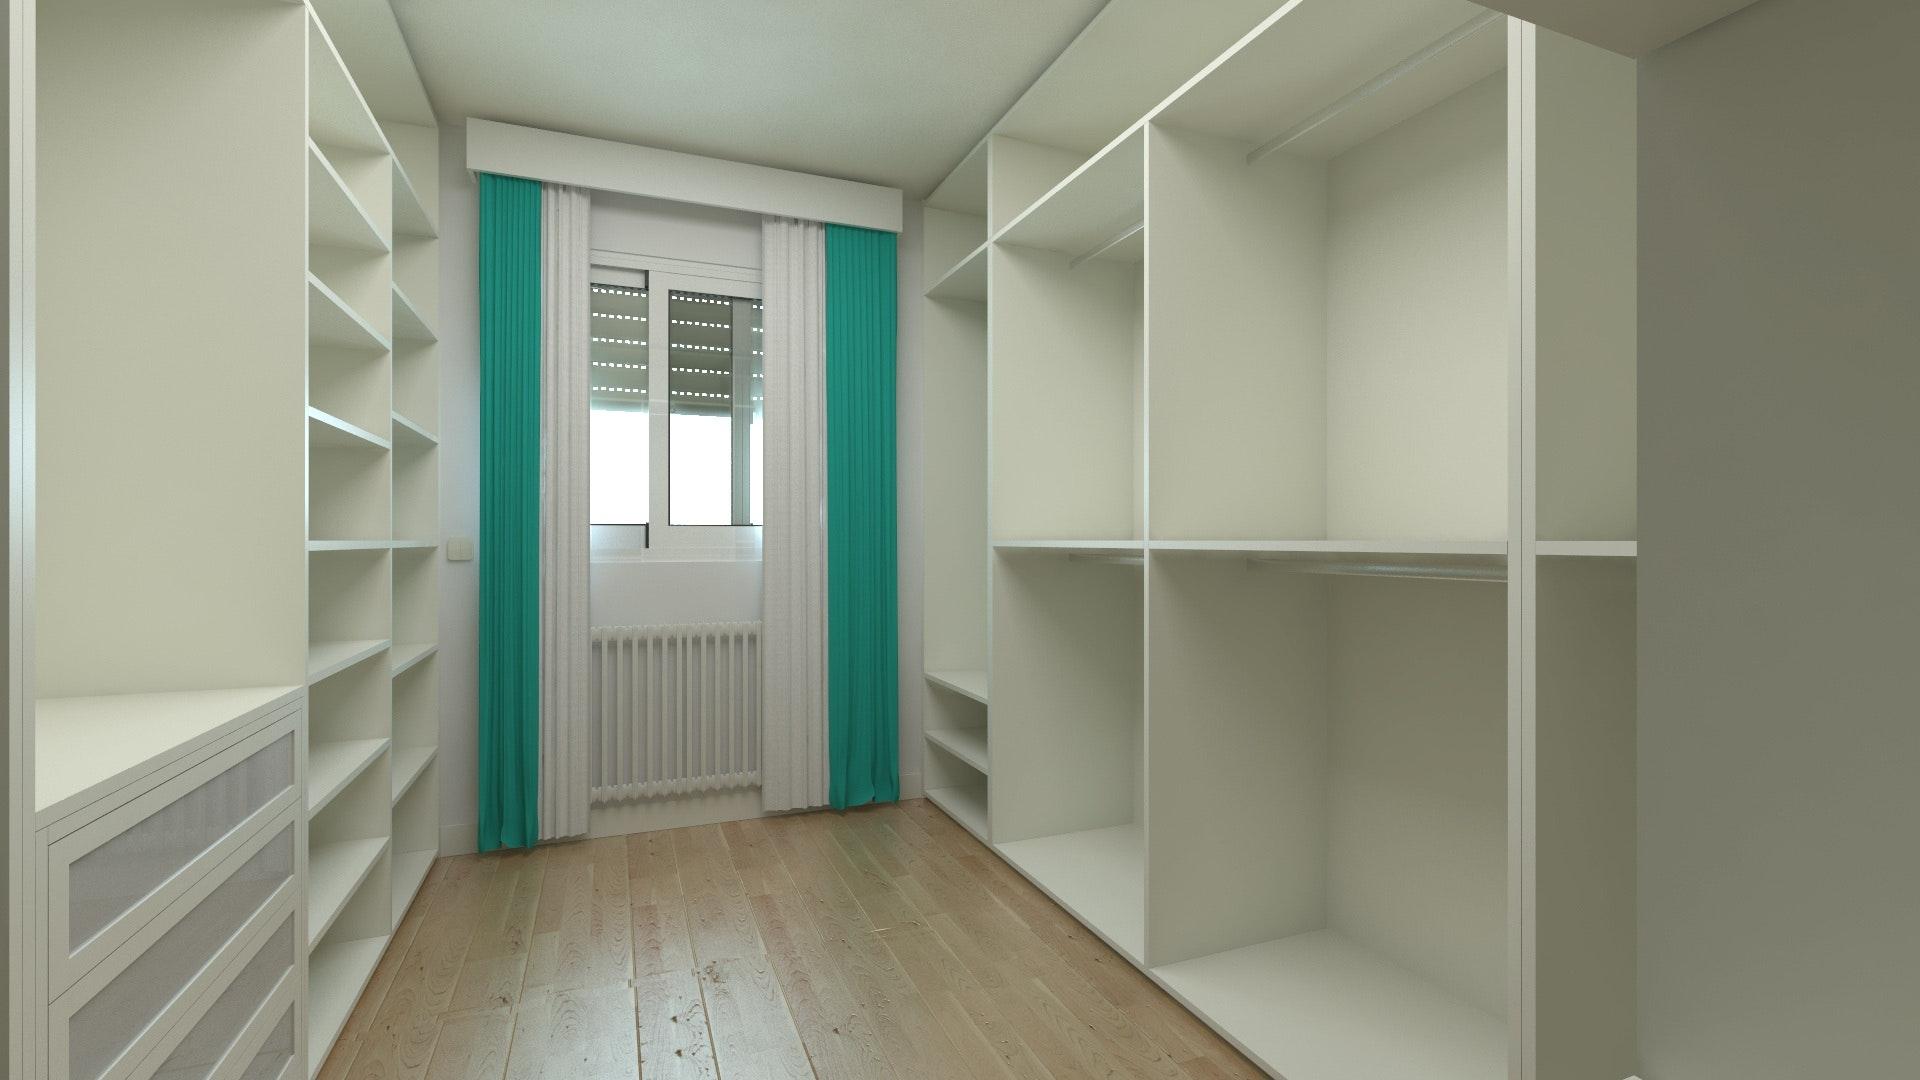 custom-closet-millwork-walk-in-cleveland-oh-contemporary-271722.jpg